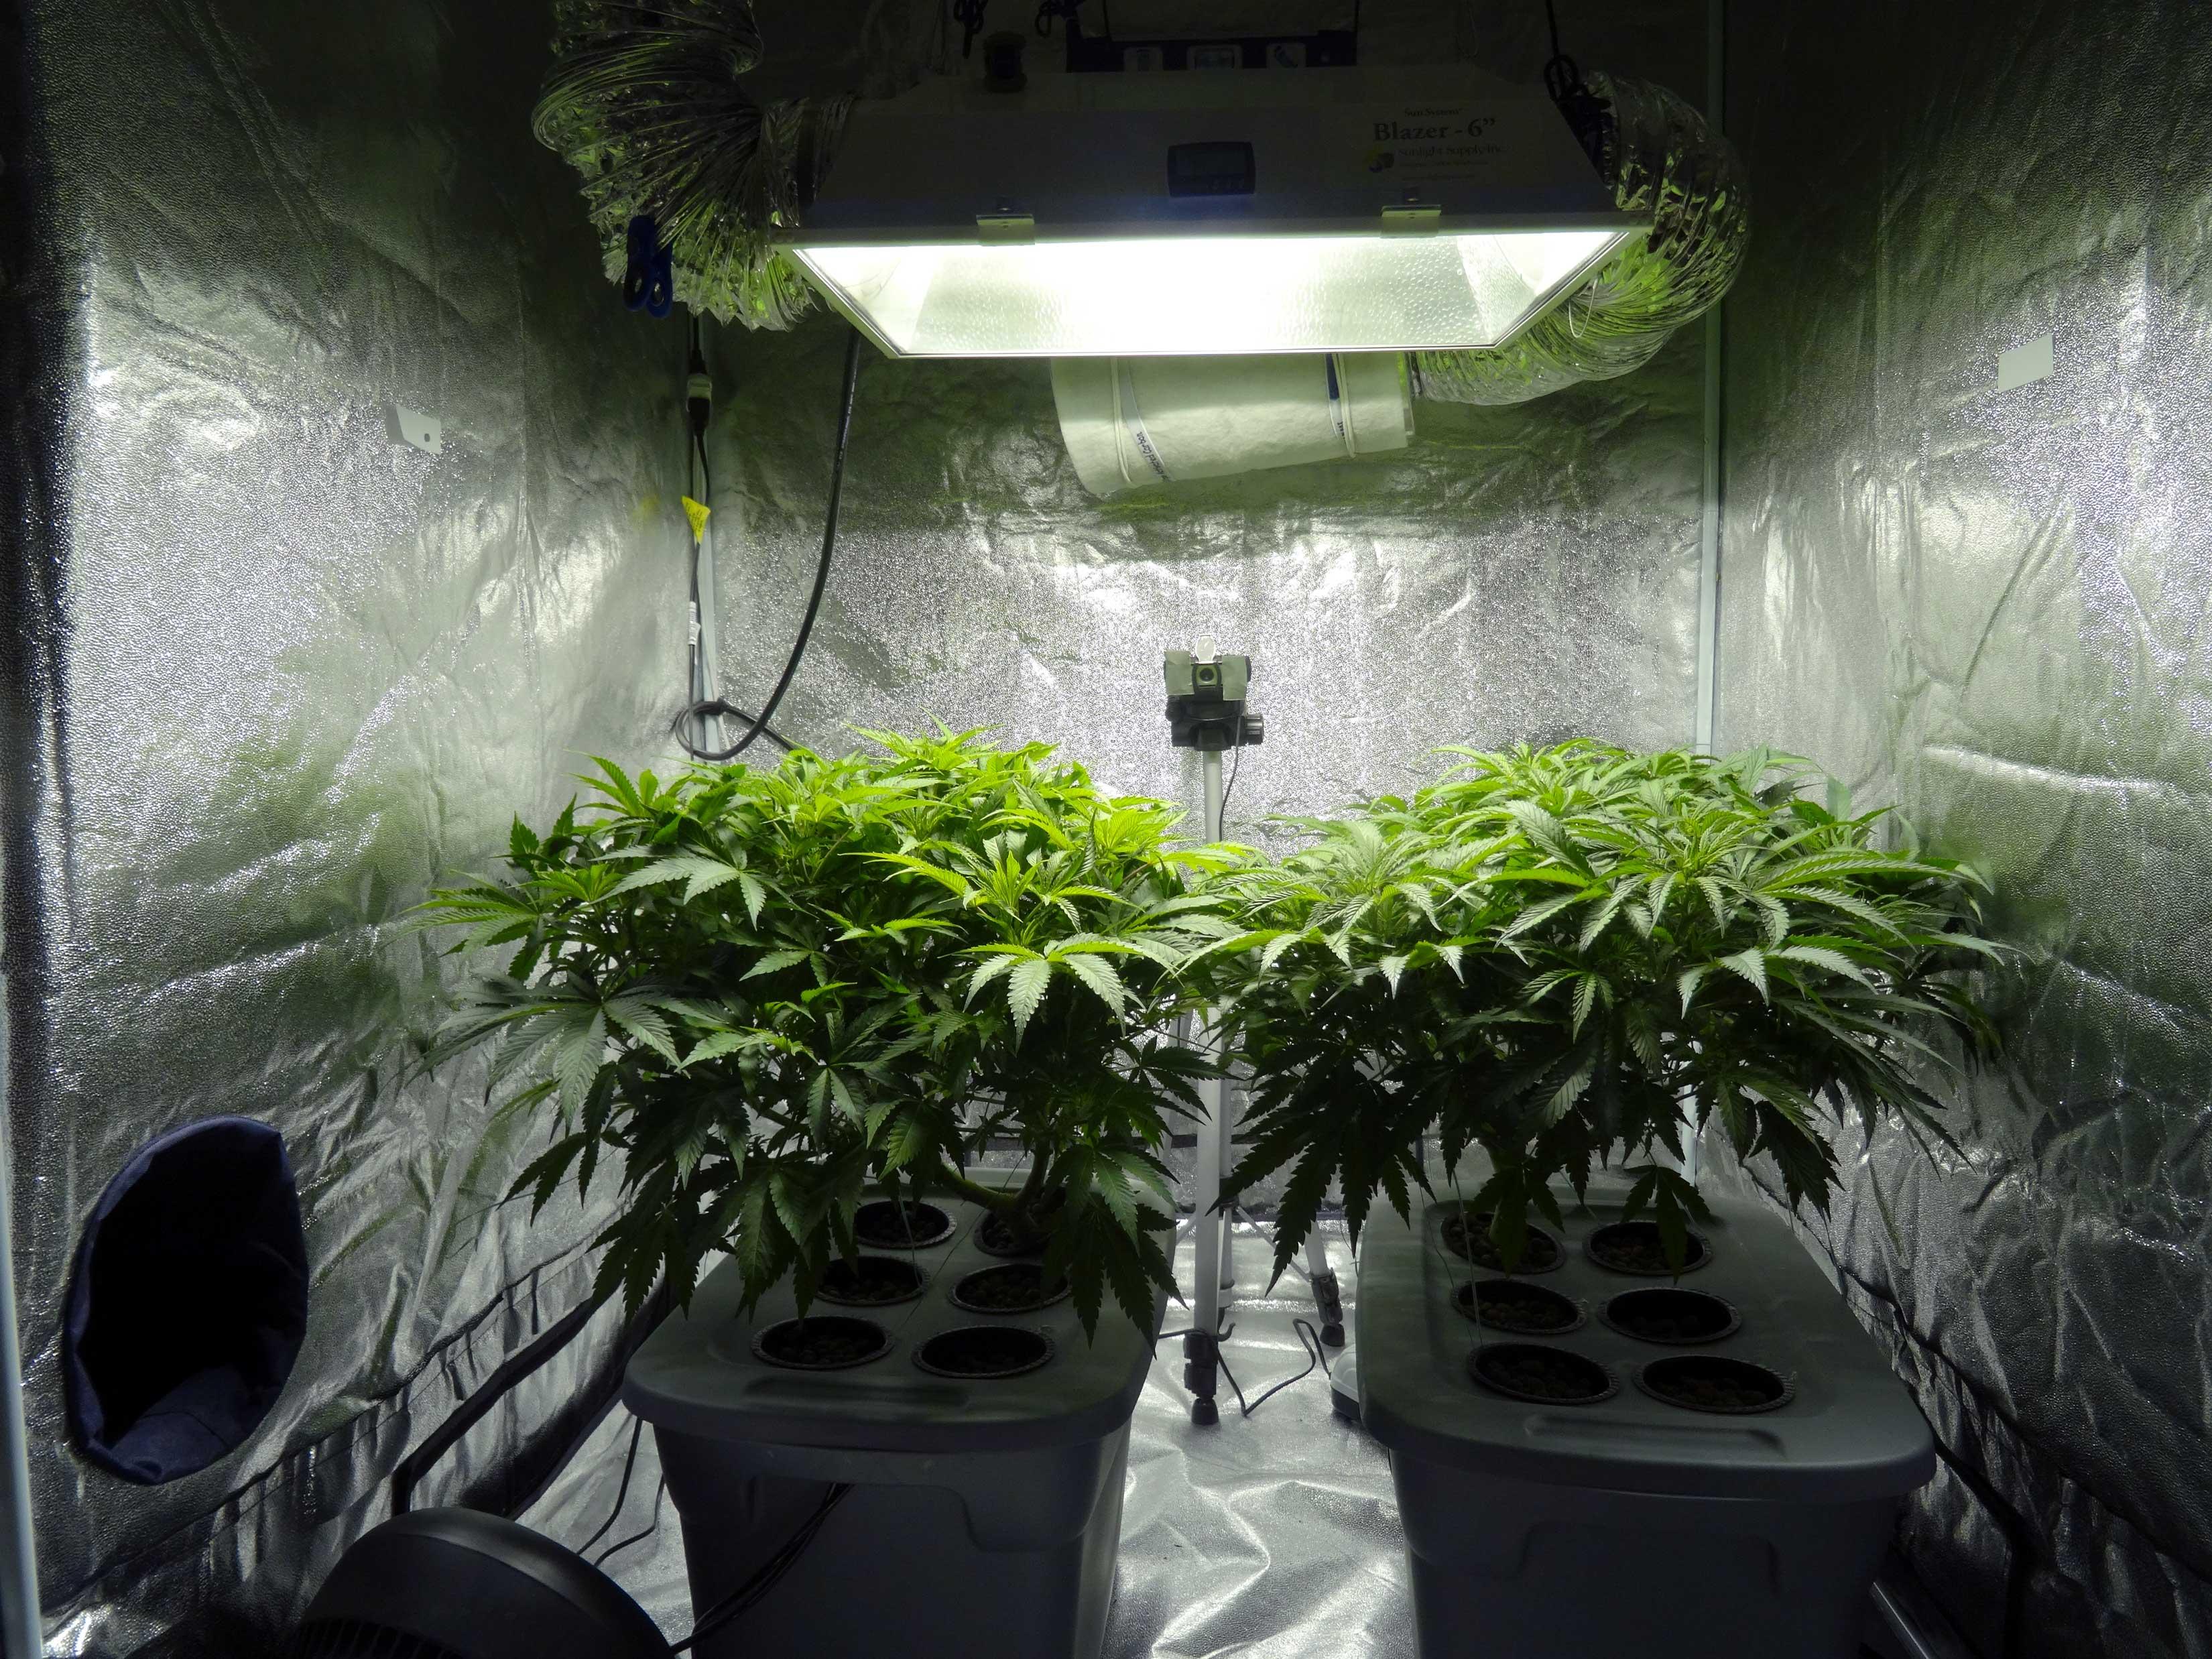 Cannabis cultivation (Source: Wikimedia Common